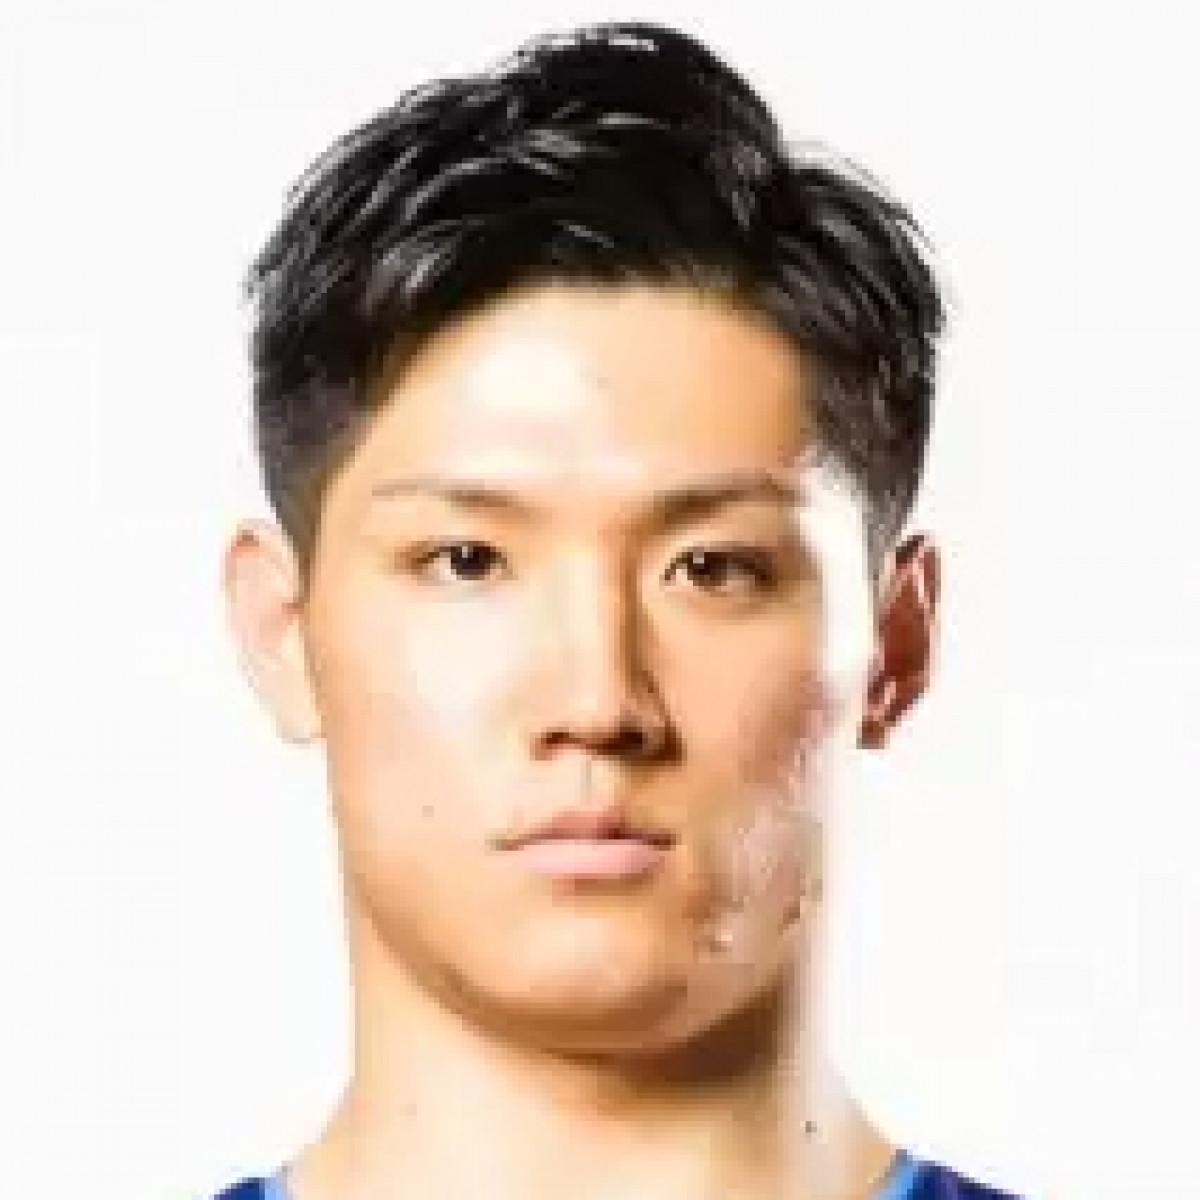 Toshio Kan